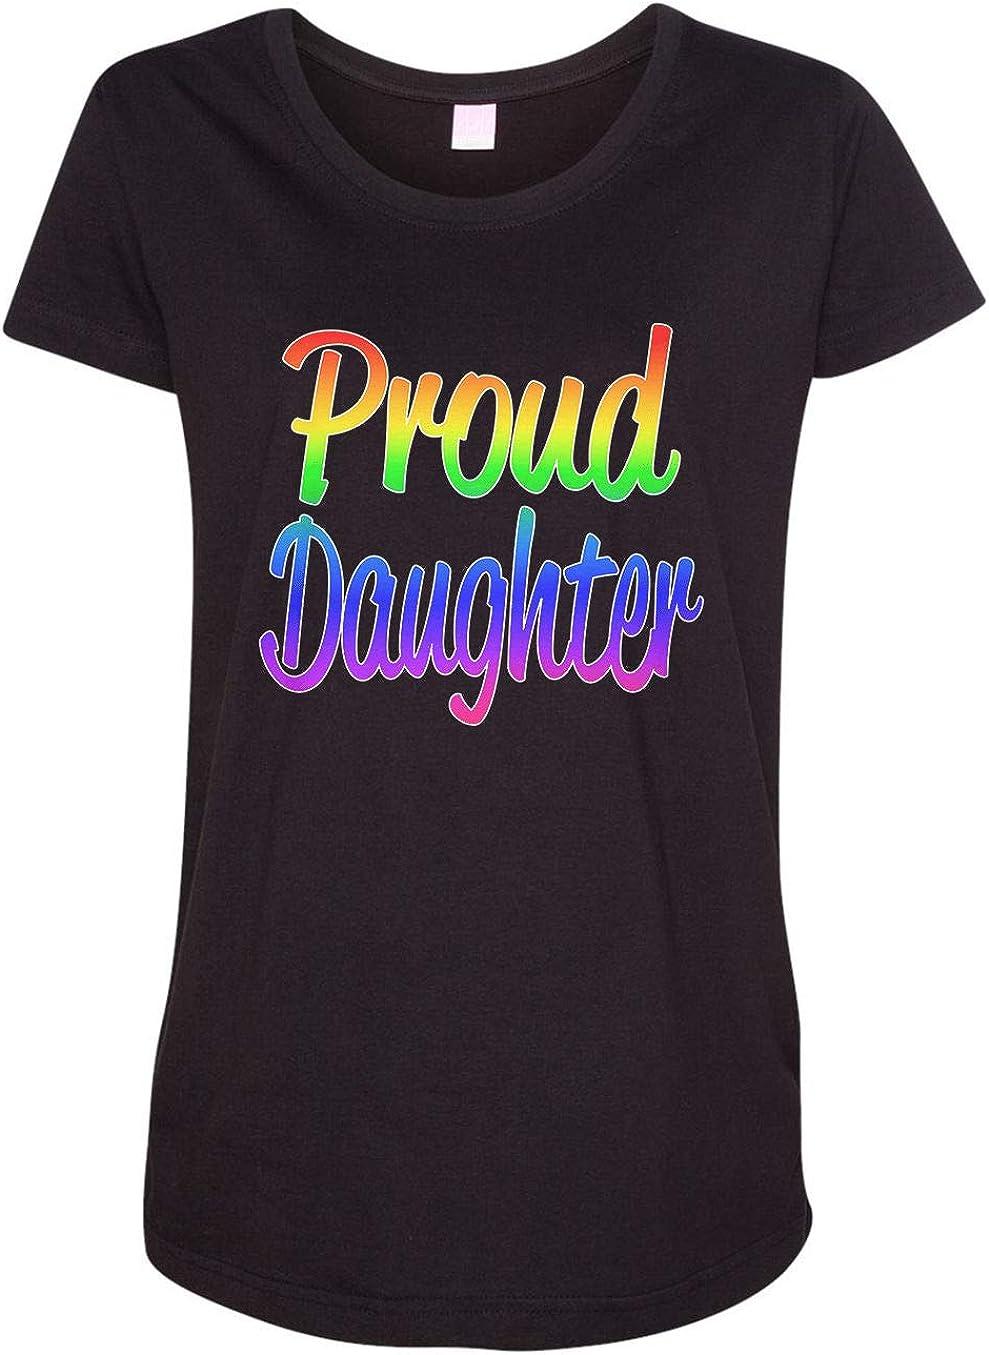 HARD EDGE DESIGN Women's Proud Long-awaited Daughter free shipping T-Shirt